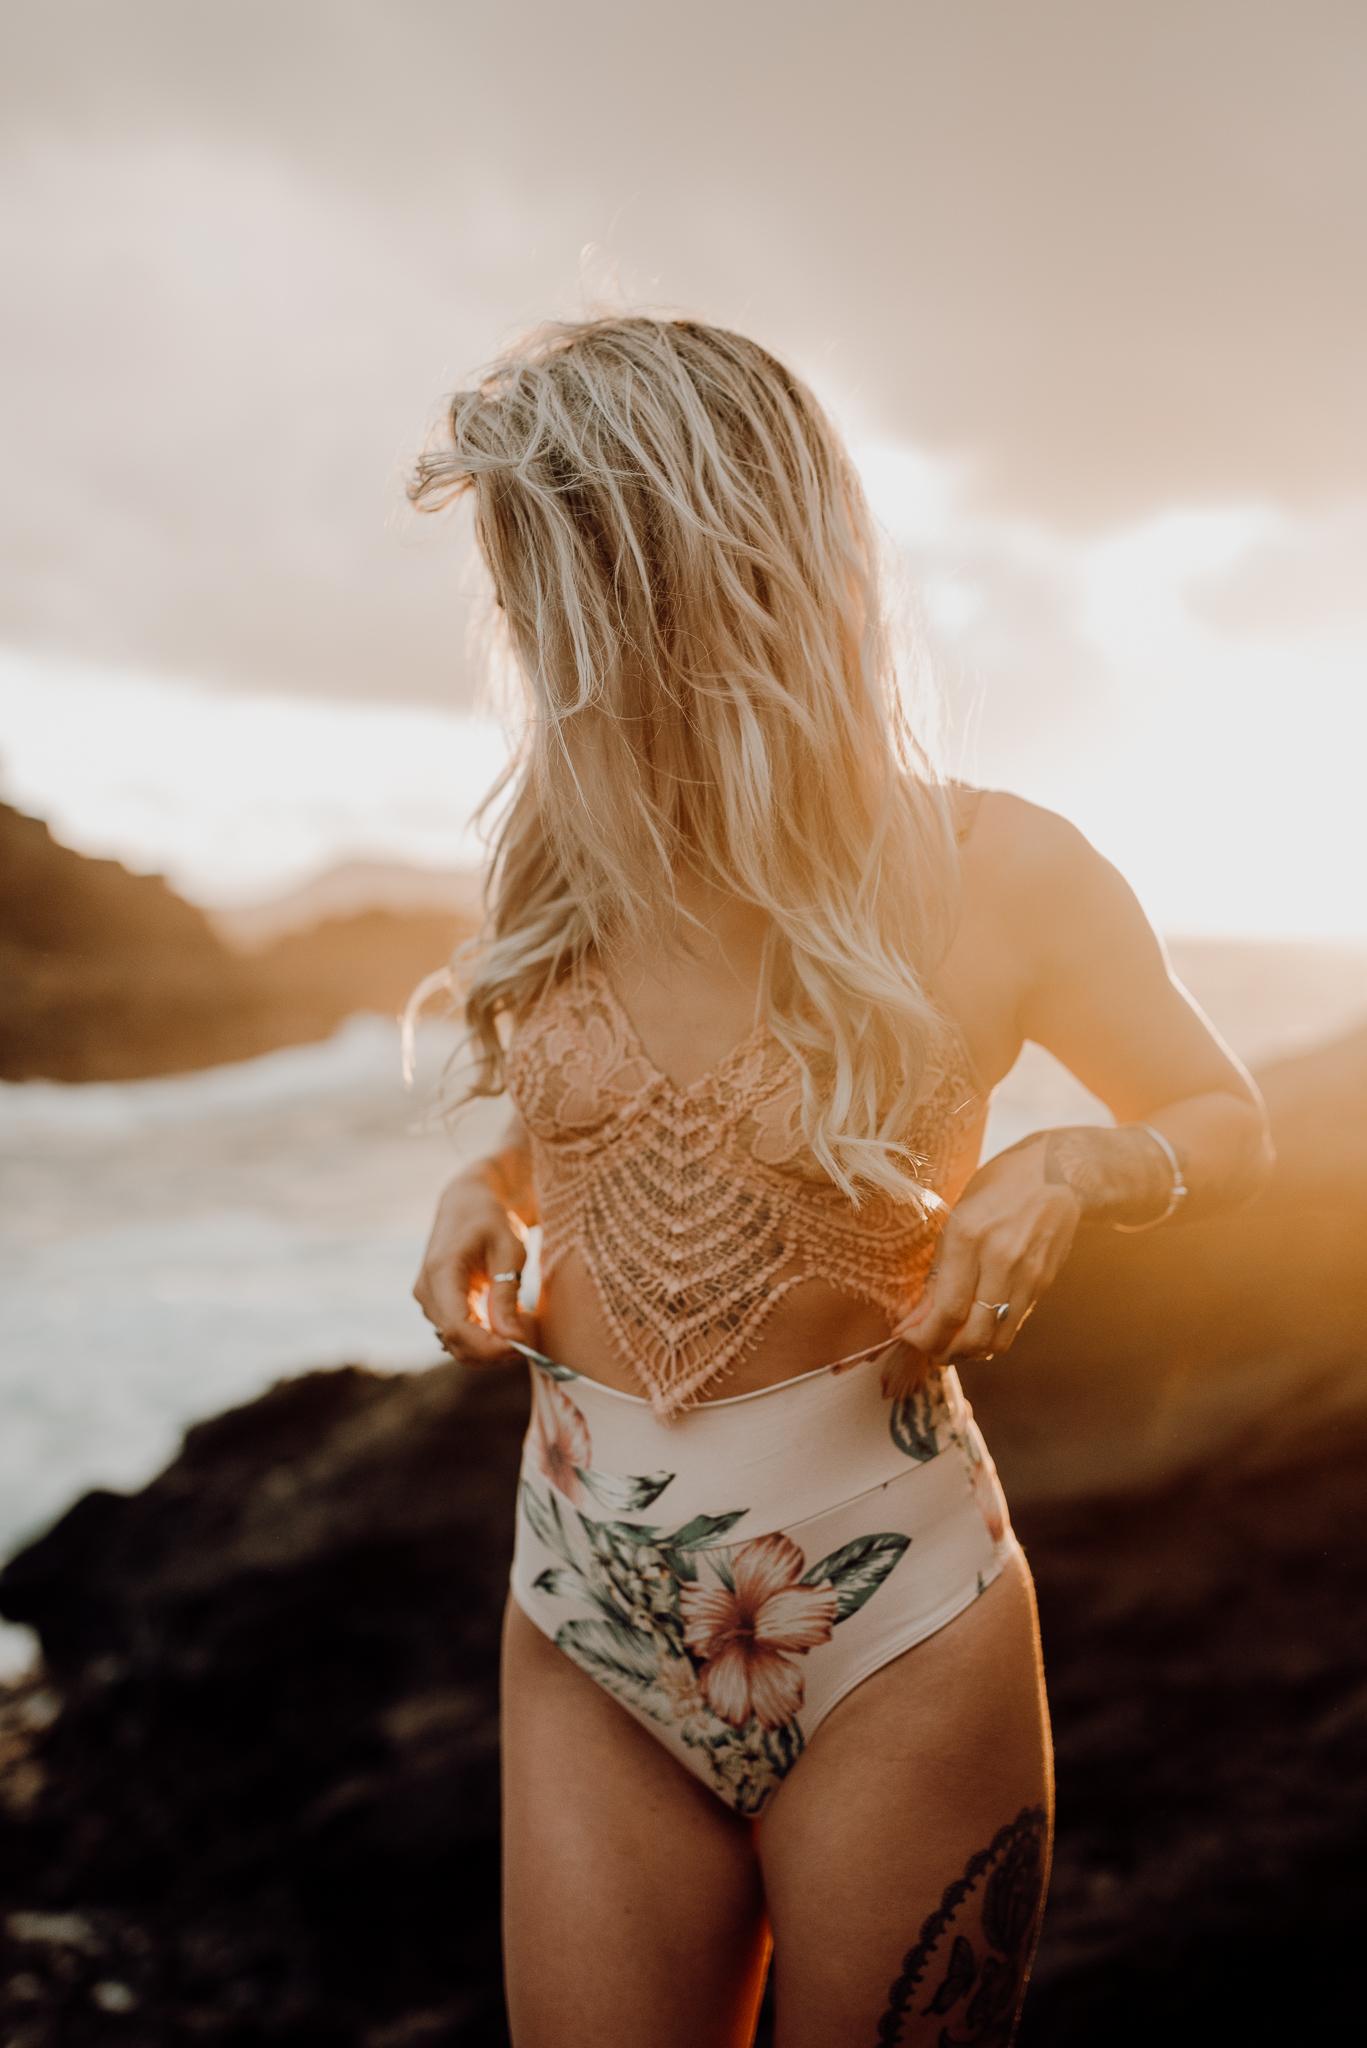 Michelle | Oahu Photographer | Kristen Giles Photography.jpg| Kristen Giles Photography - 004.jpg